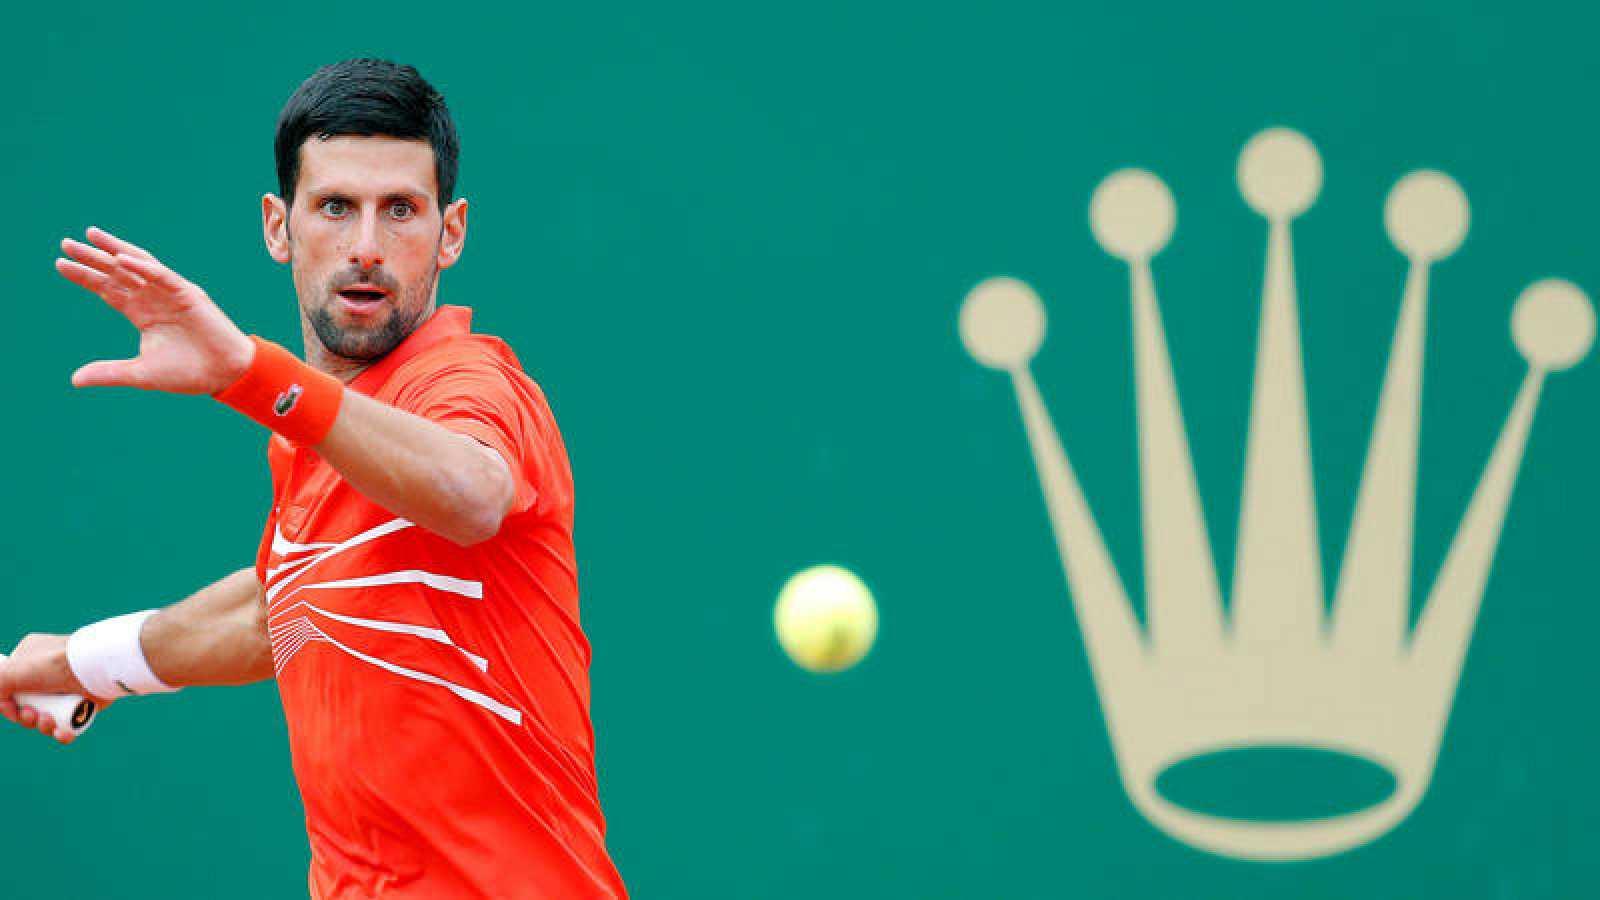 El serbio Novak Djokovic devuelve la bola al alemán Philipp Kohlschreiber.